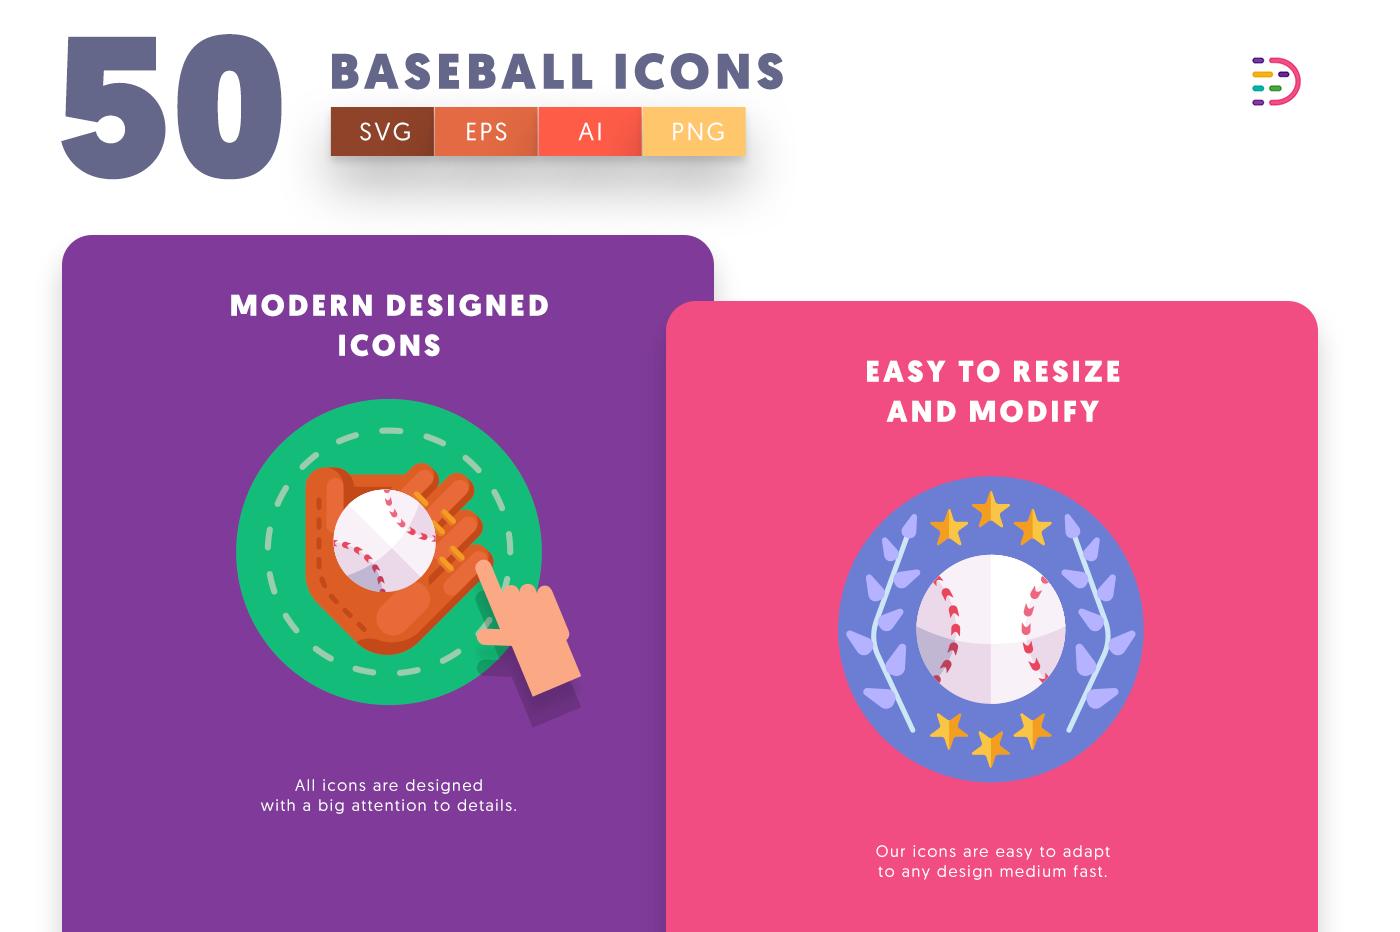 Baseball icons png/svg/eps